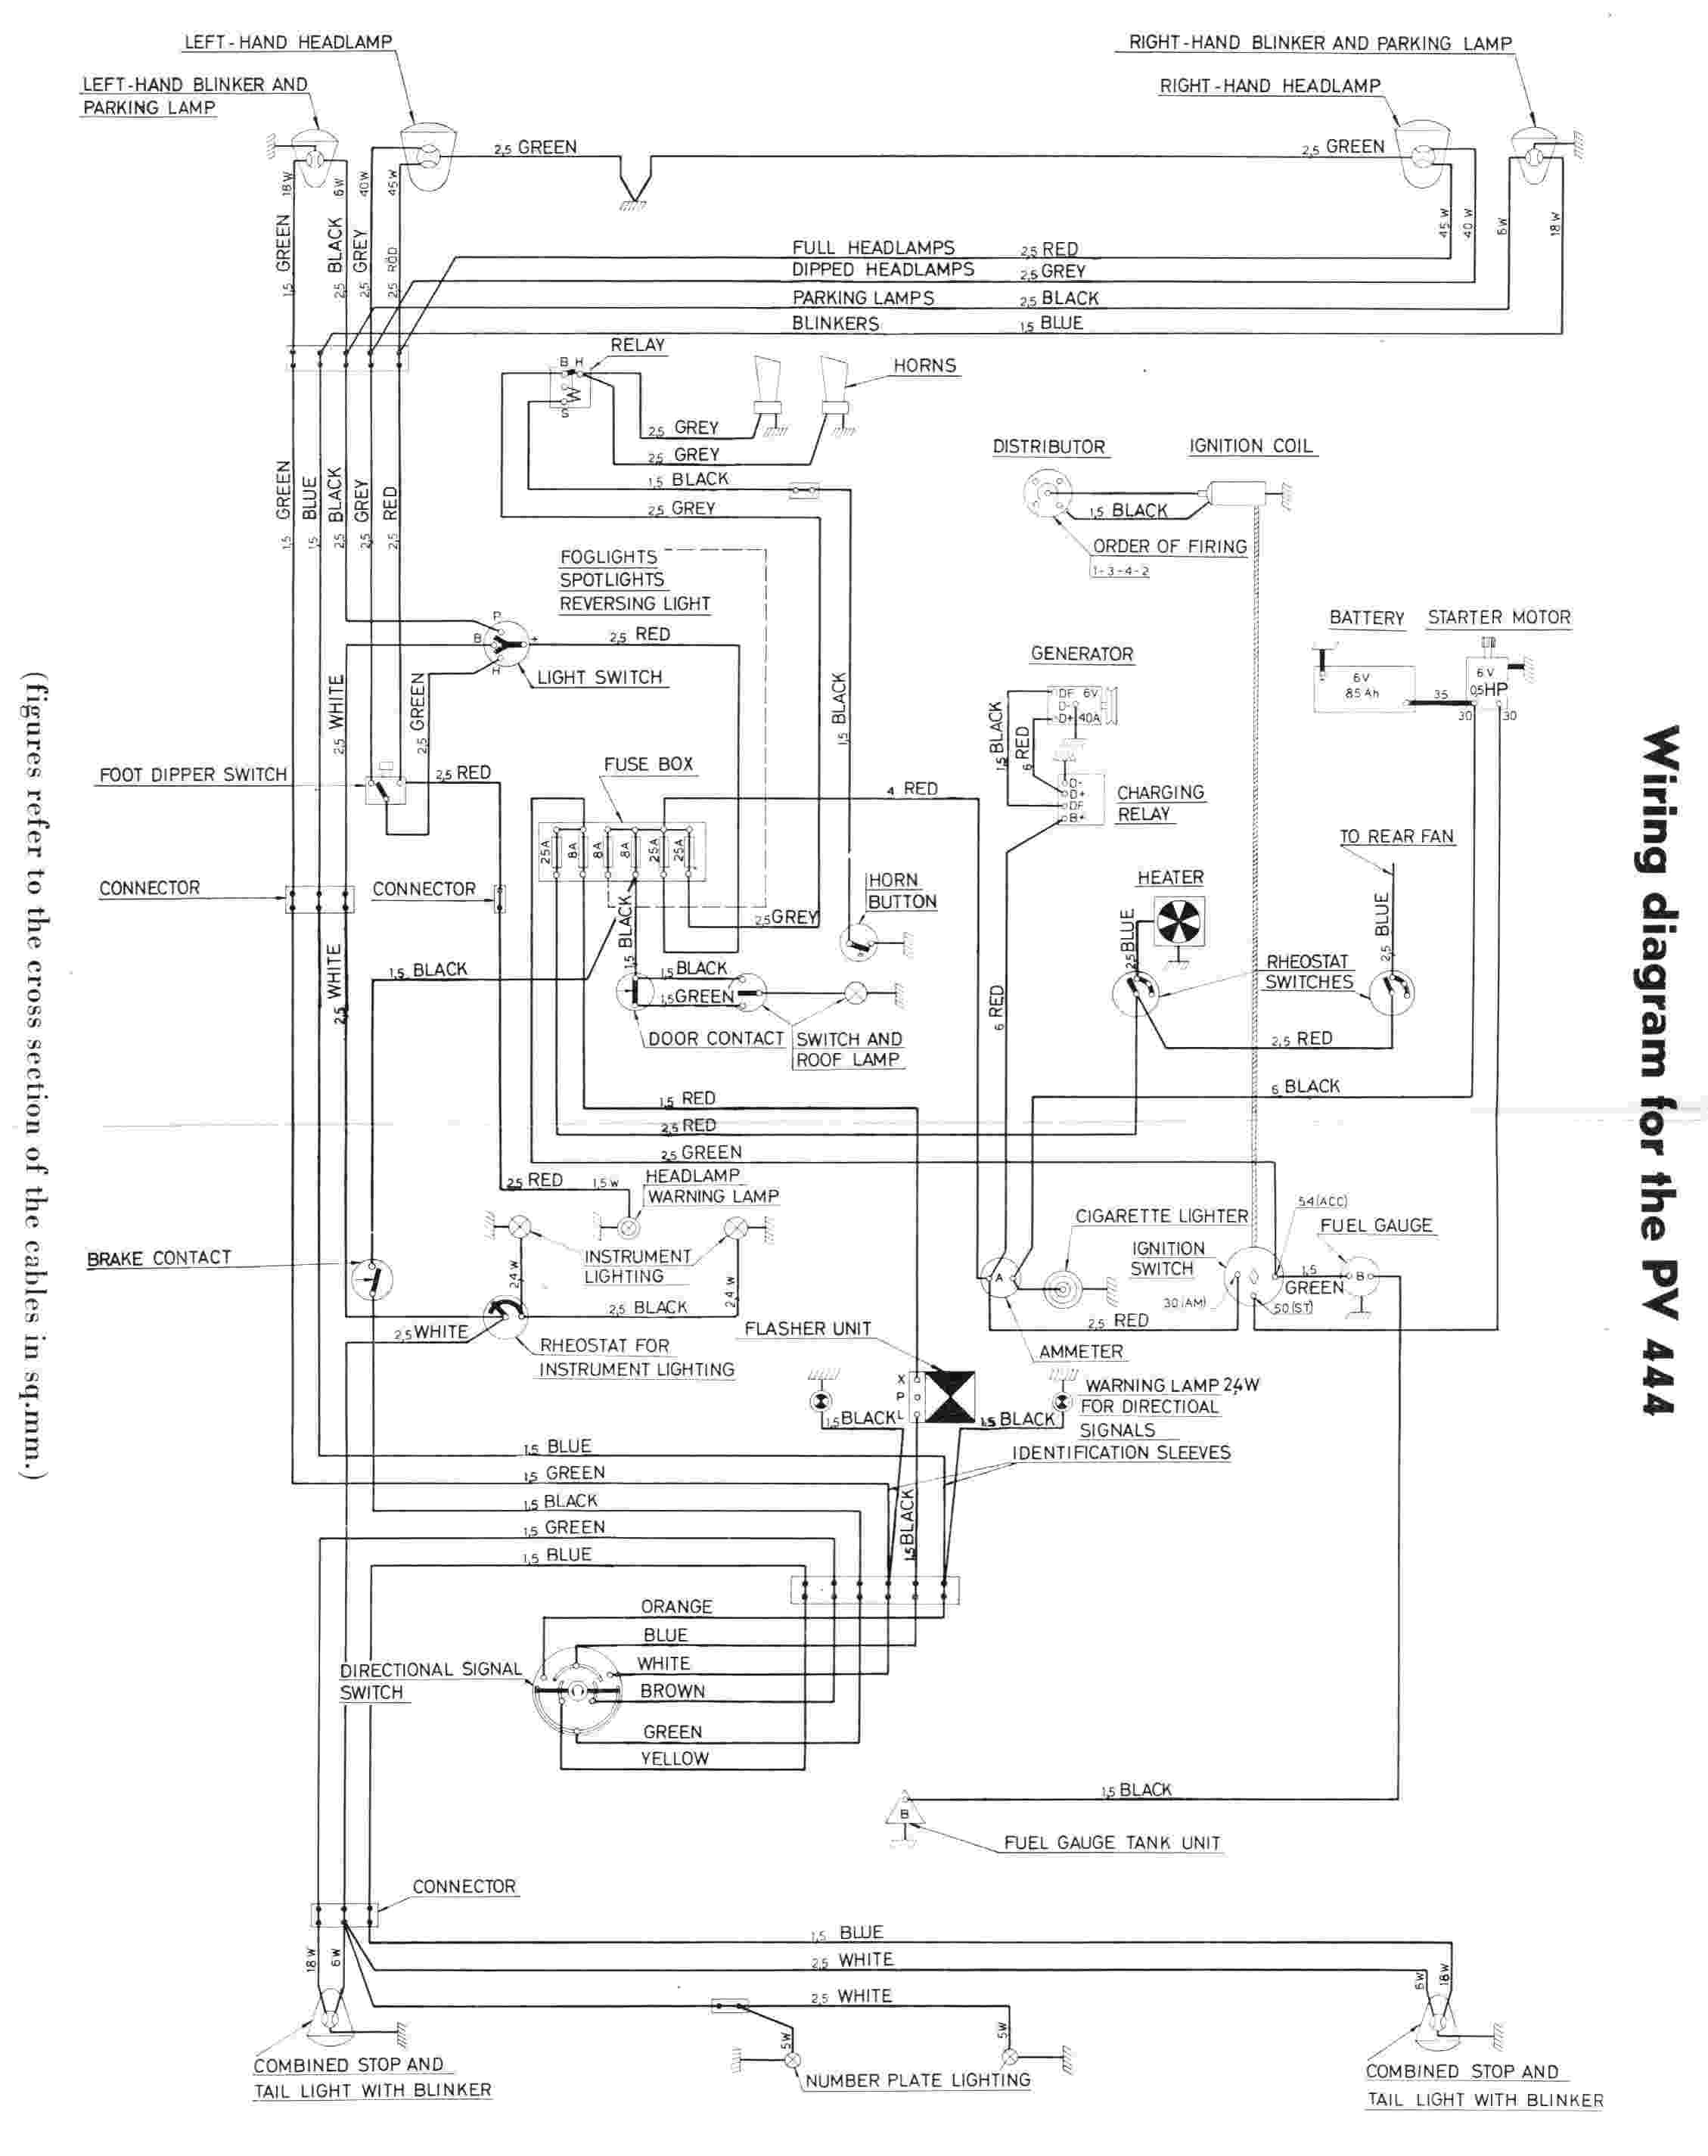 2004 Volvo Truck Wiring Diagrams Diagram Libraries Circuit Goodman Board Gpg1336090m41aa Todays2004 Schema